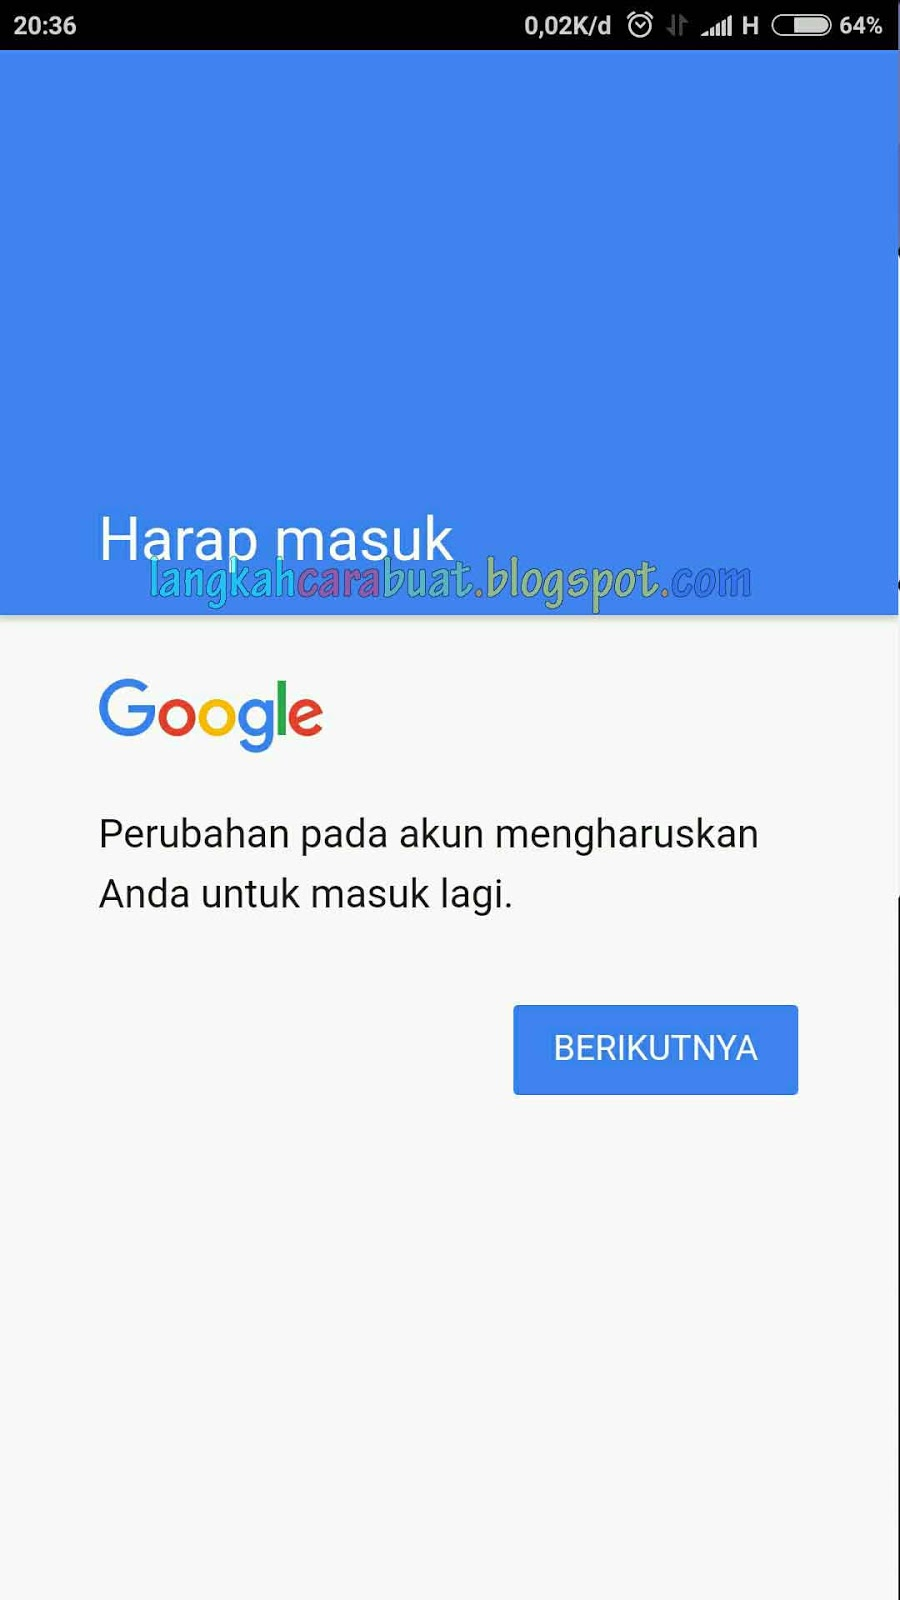 Cara Memulihkan Akun Google Di Hp Android Perlu Tindakan Tambahan Langkah Cara Buat